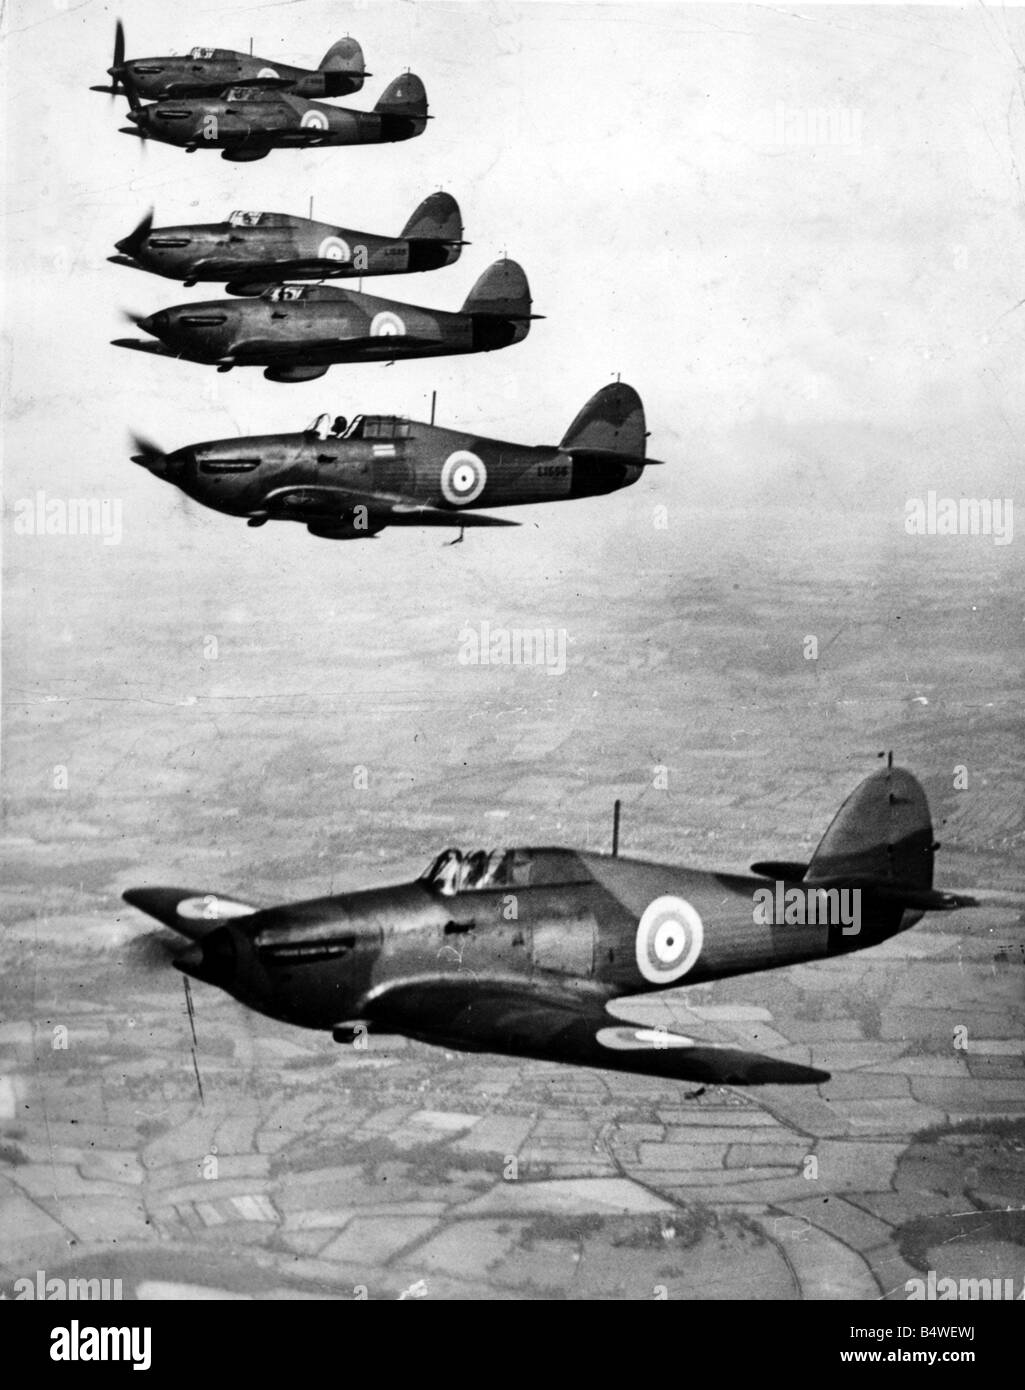 war world war ii battle of britain picture shows a group